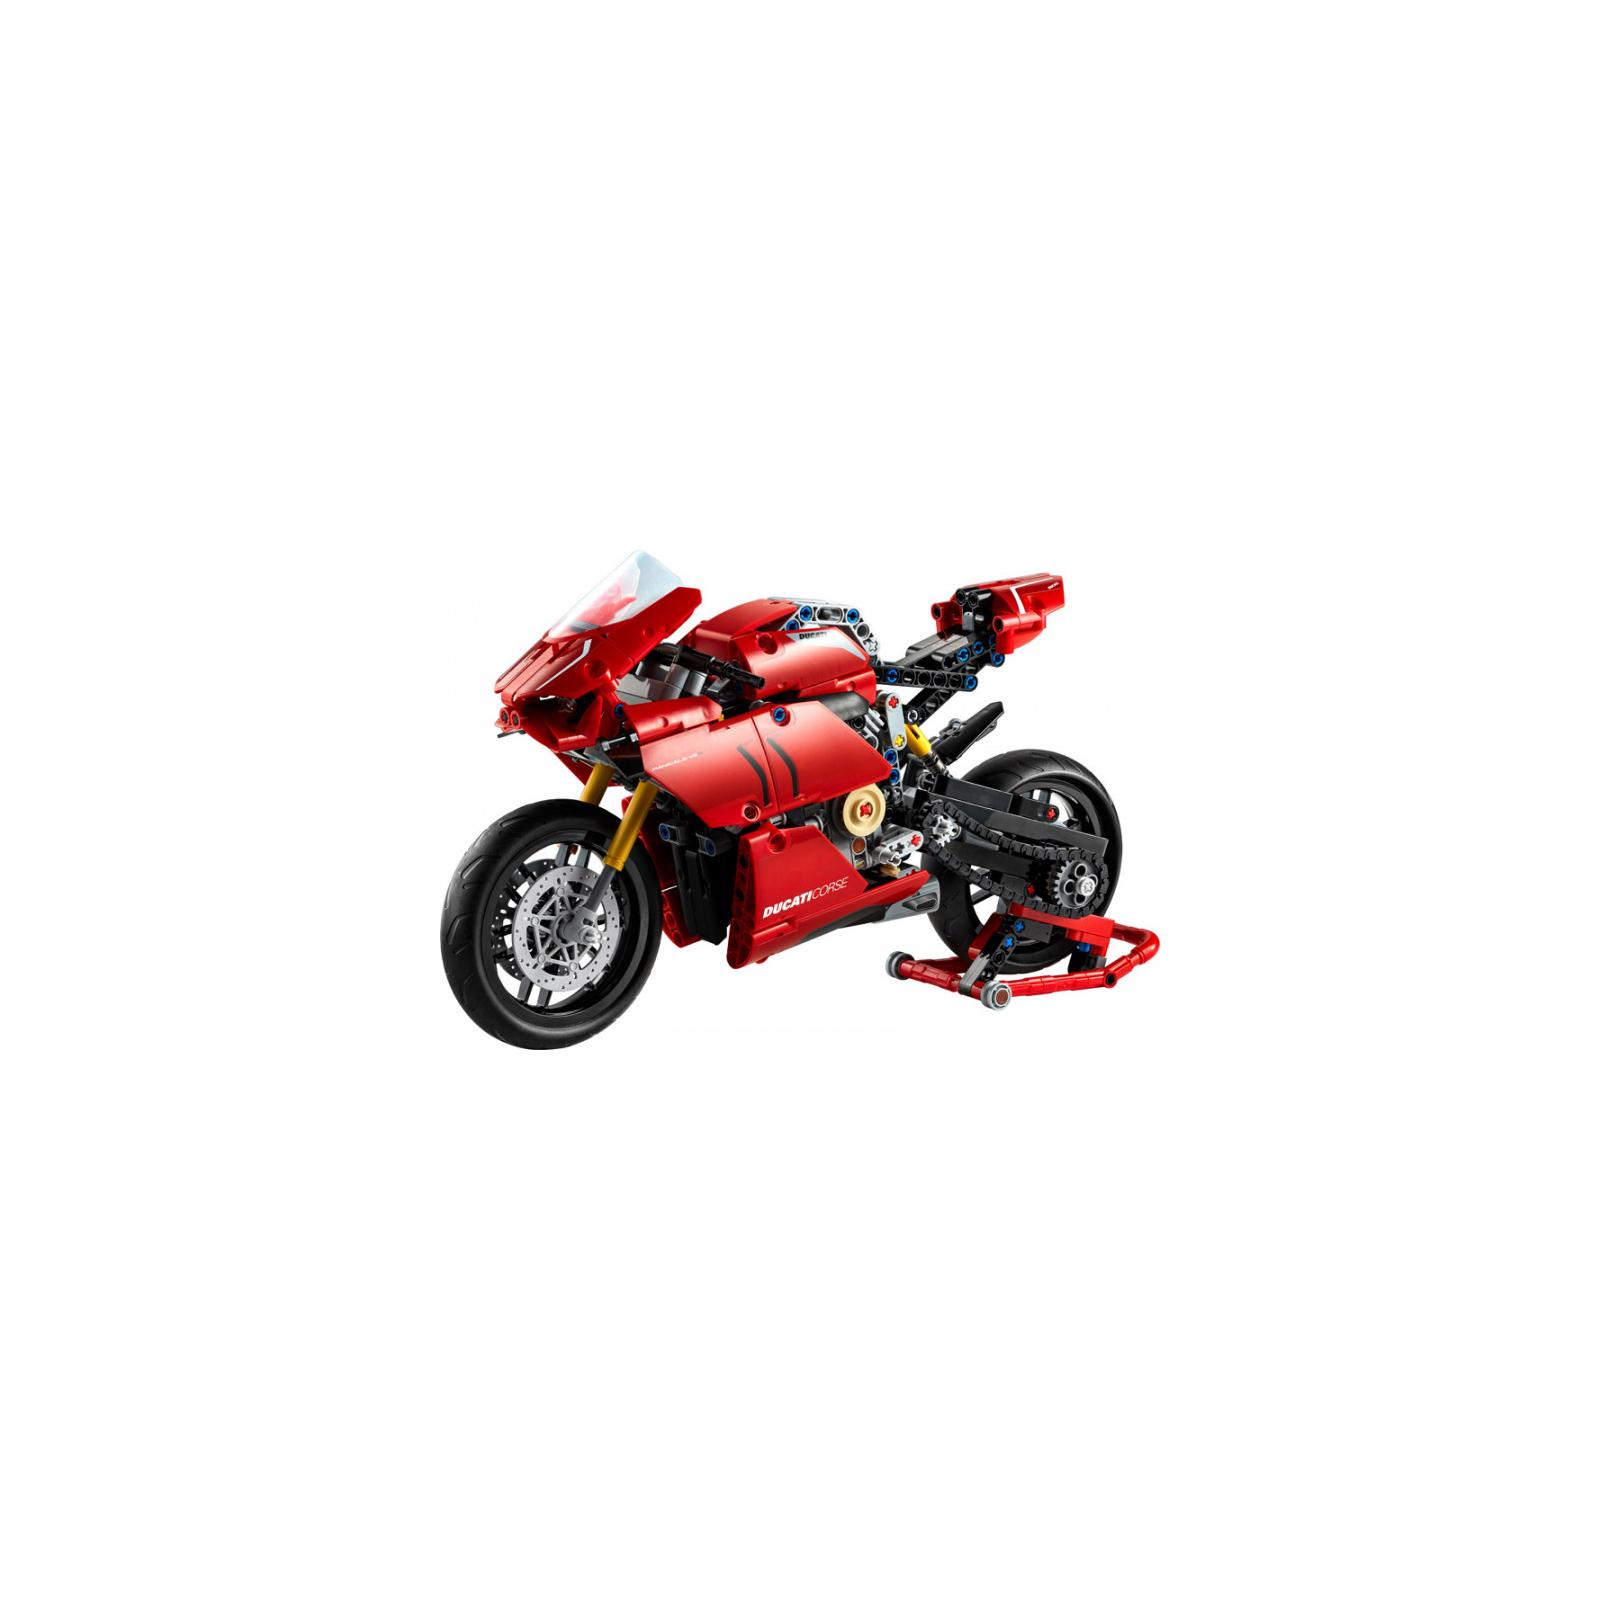 Конструктор LEGO Technic Ducati Panigale V4 R 0 646 детали (42107) изображение 2